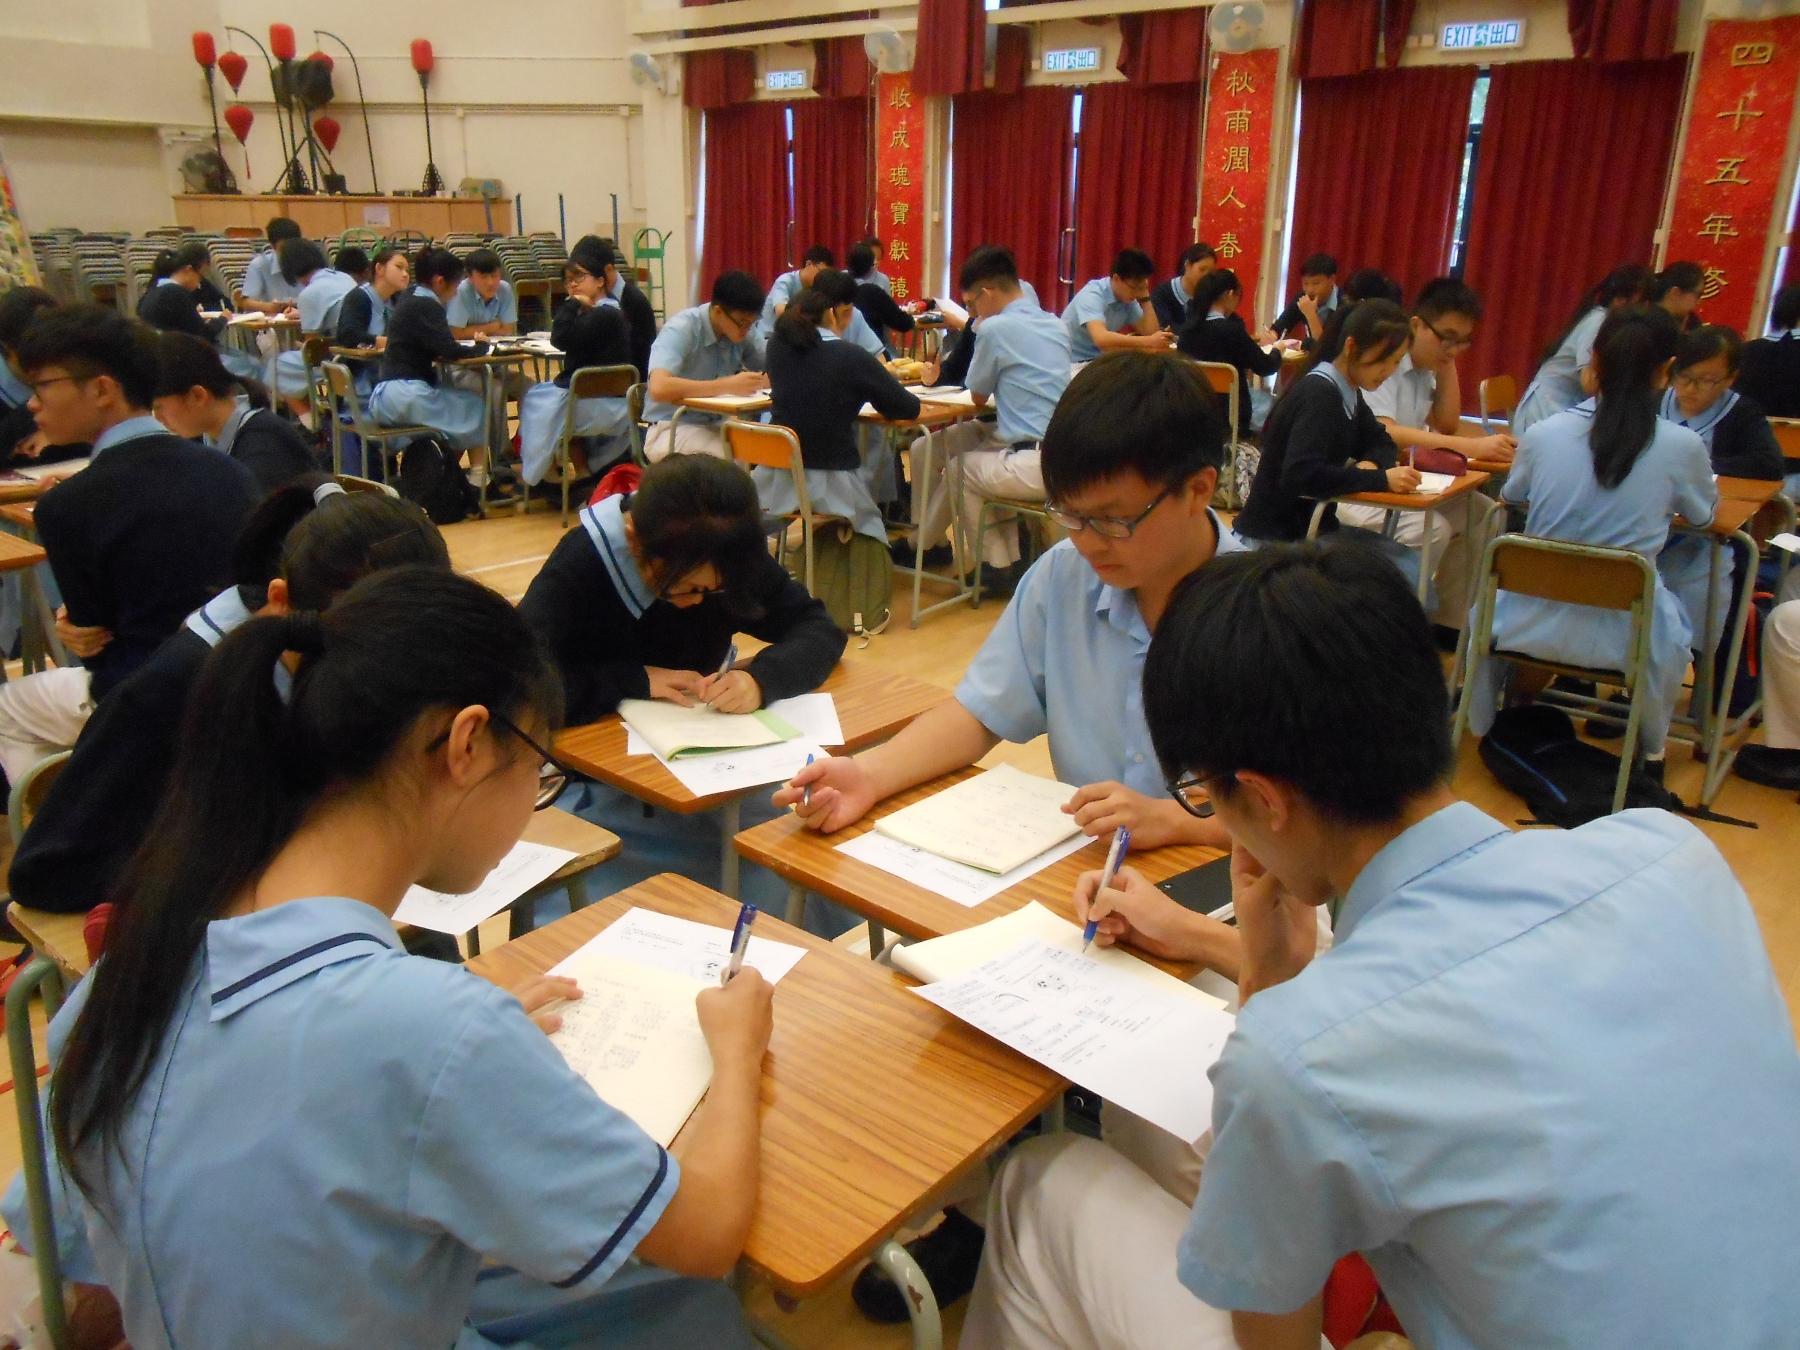 http://www.npc.edu.hk/sites/default/files/dscn8913.jpg